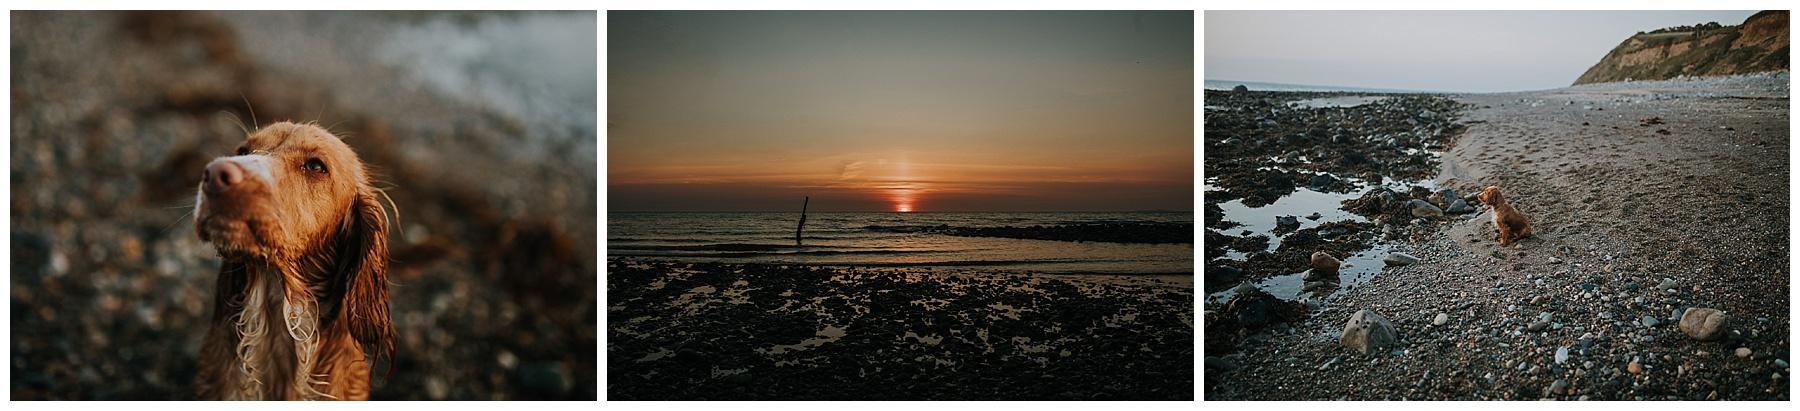 the sun sets into the sea